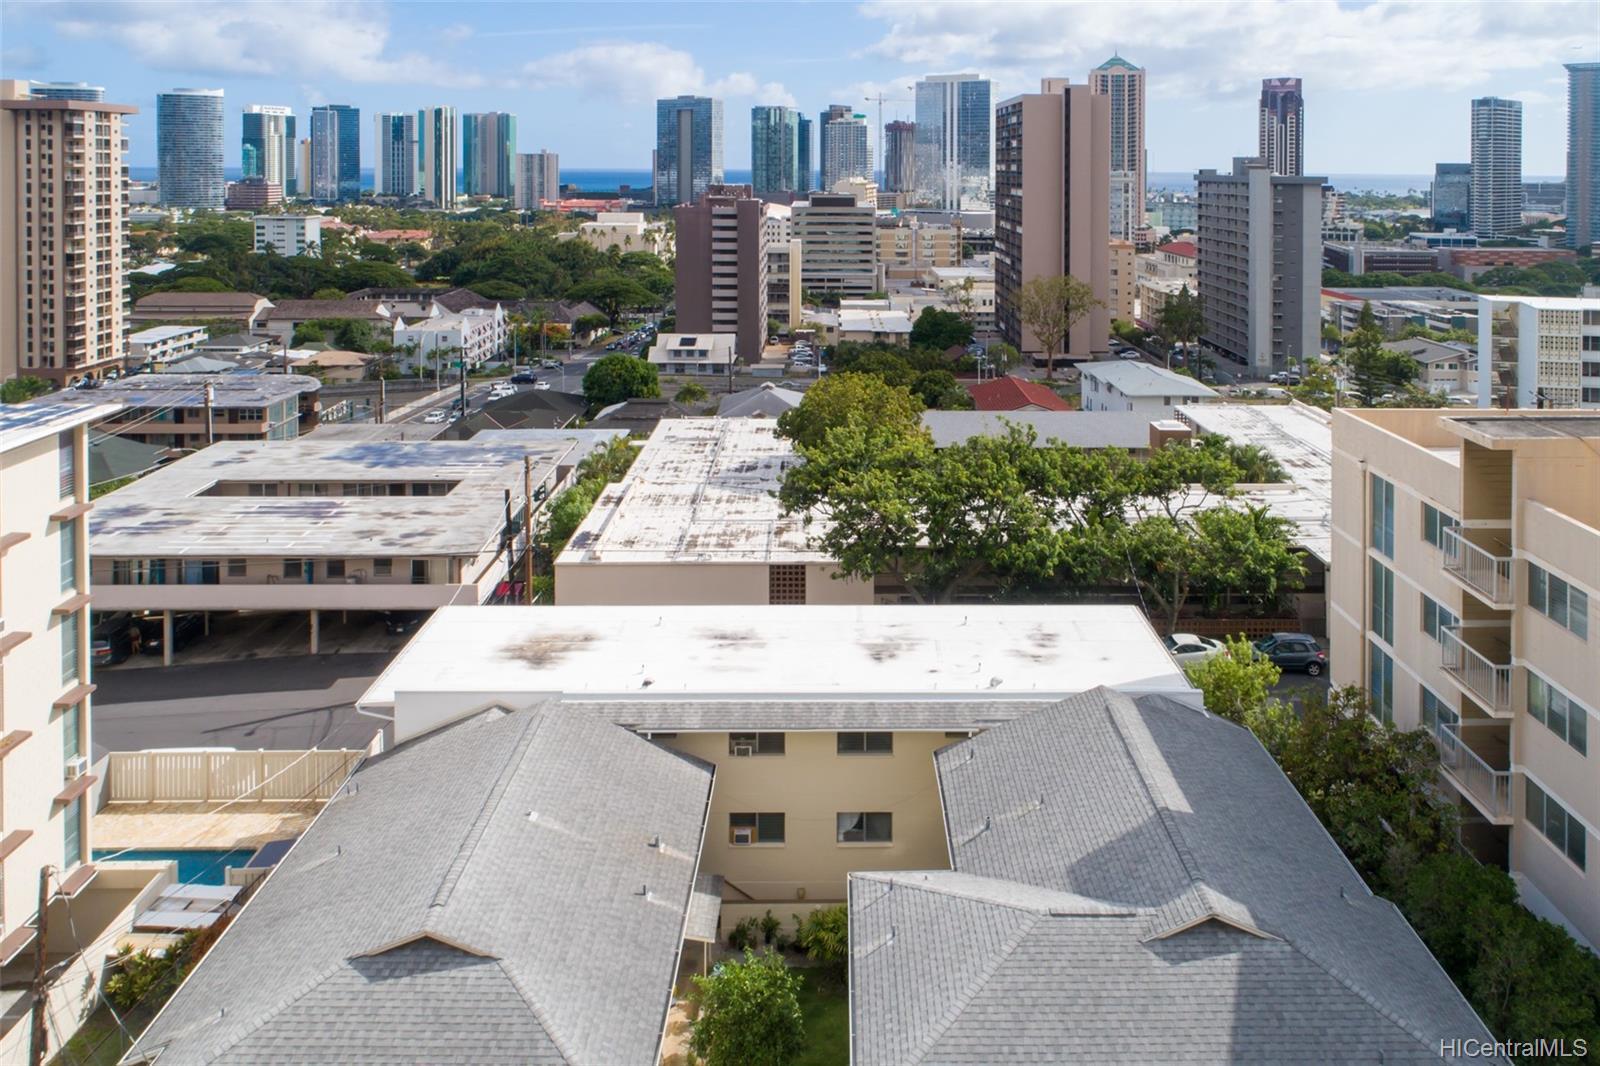 810 Green Street Honolulu - Multi-family - photo 2 of 25